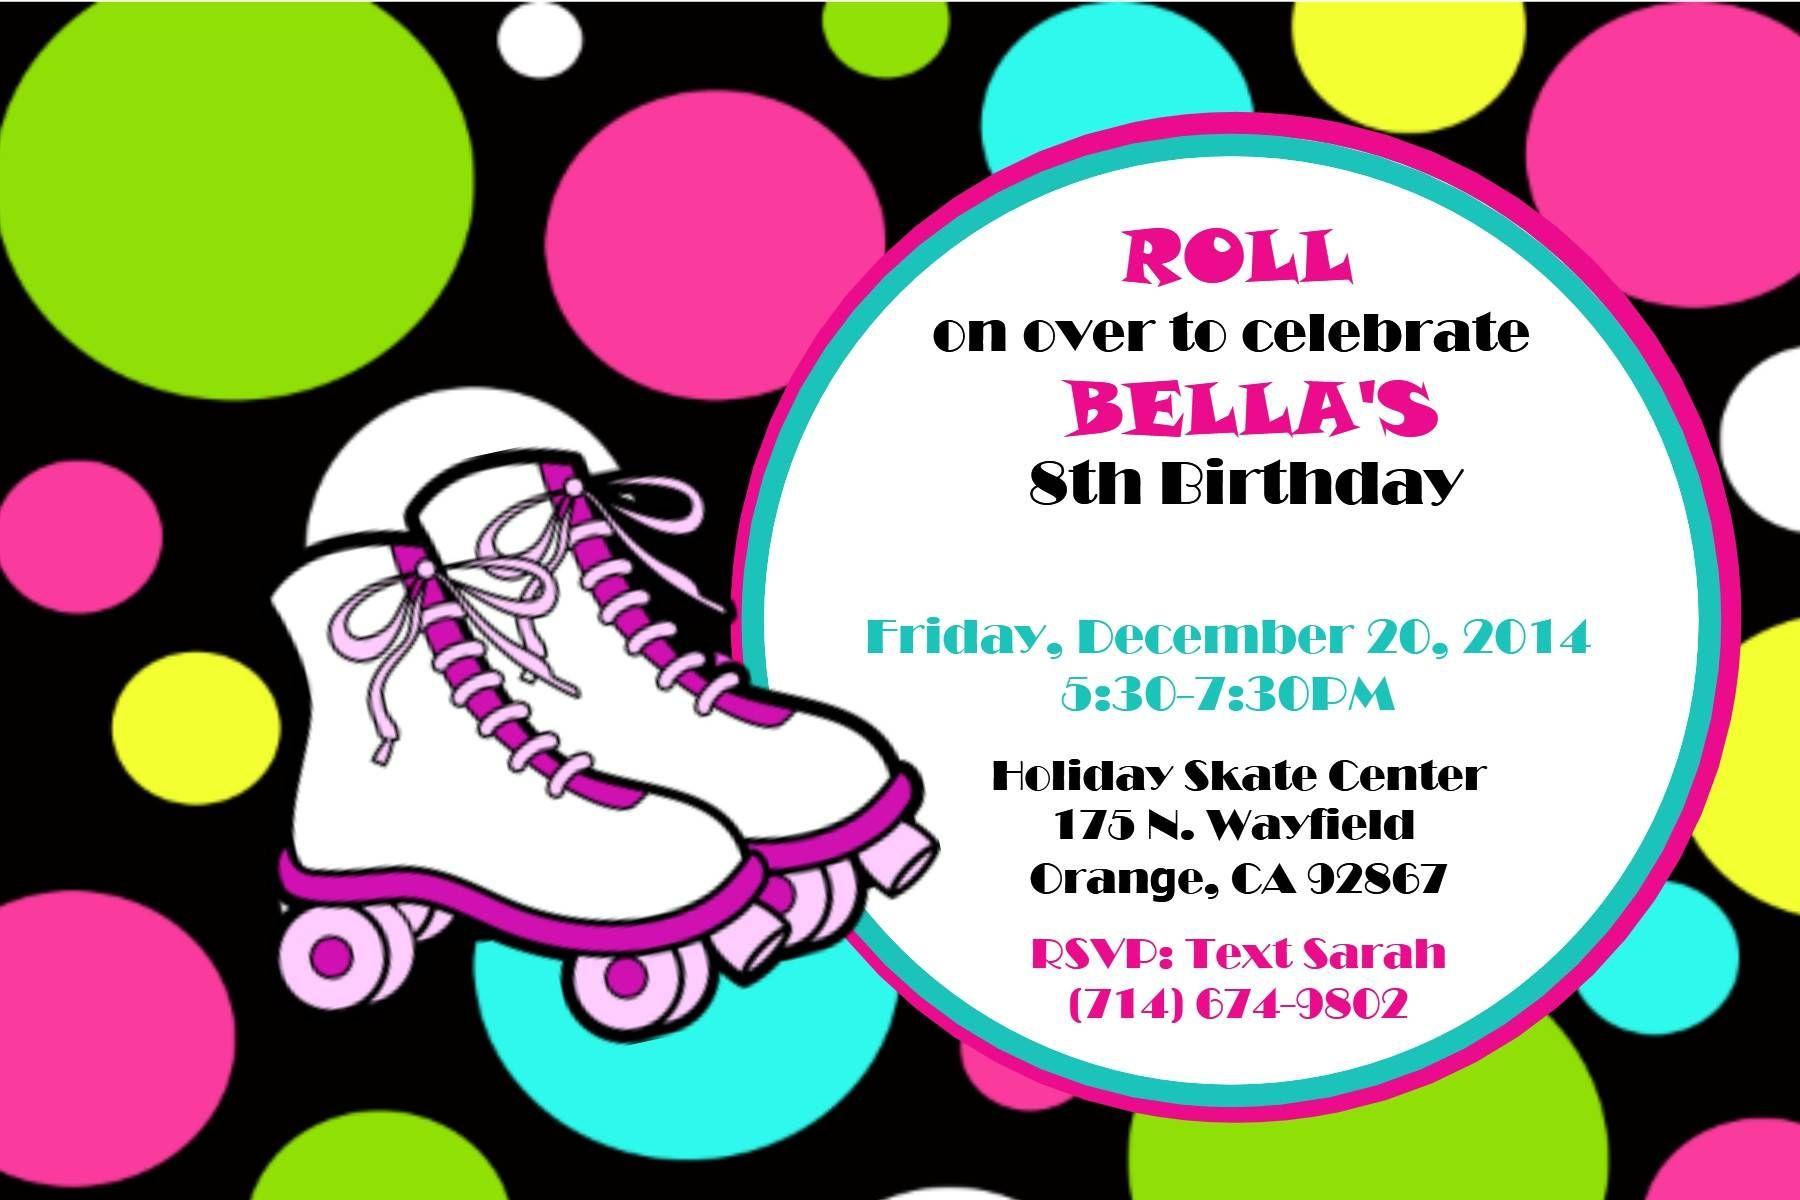 Roller Skating Party Invitations Printable Free | Roller Skating ...